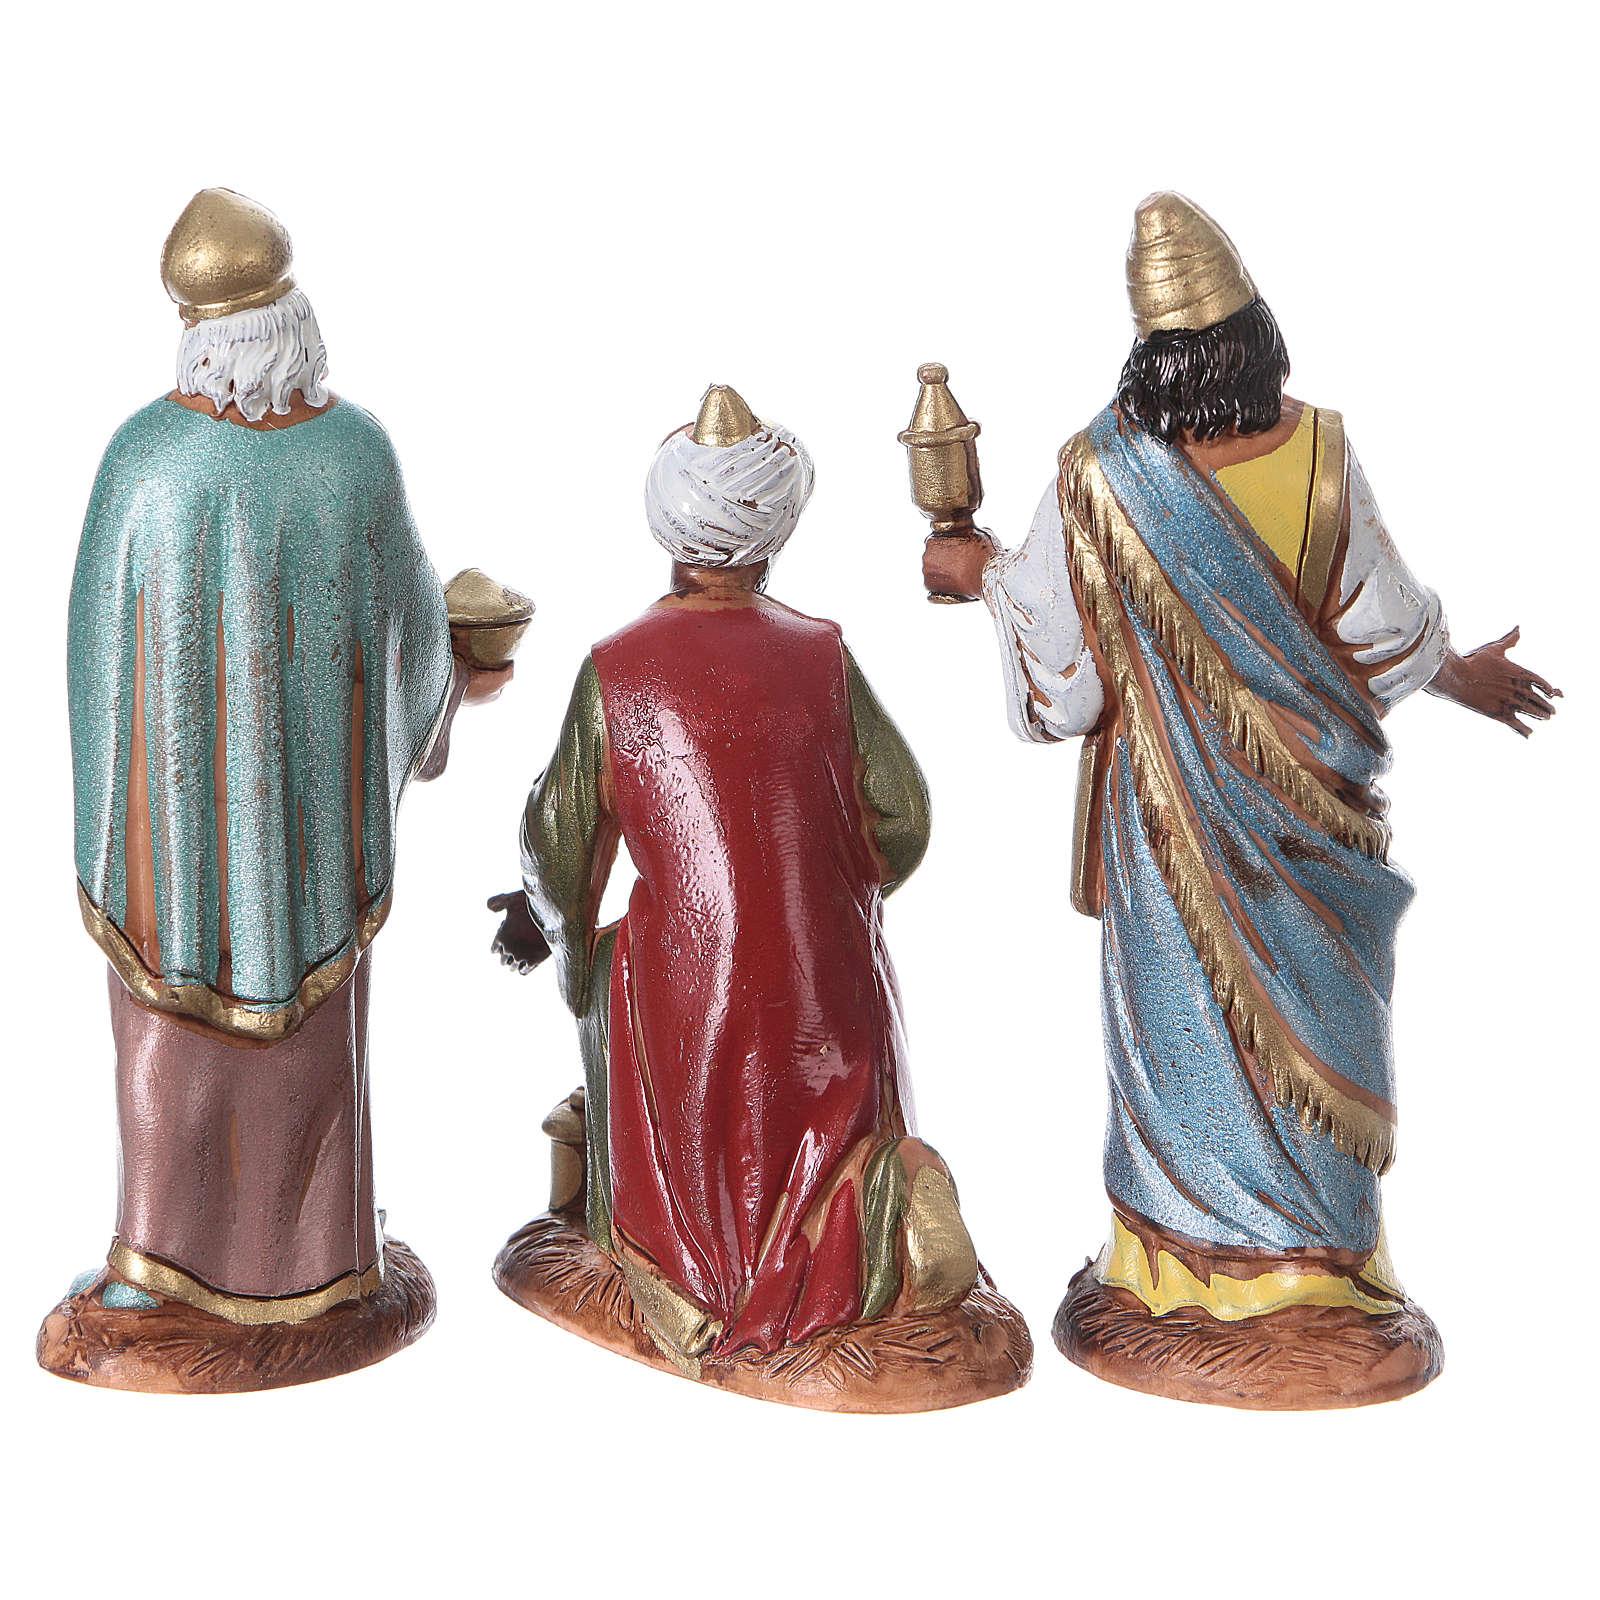 Re magi costumi storici 3 pz Moranduzzo 10 cm 4